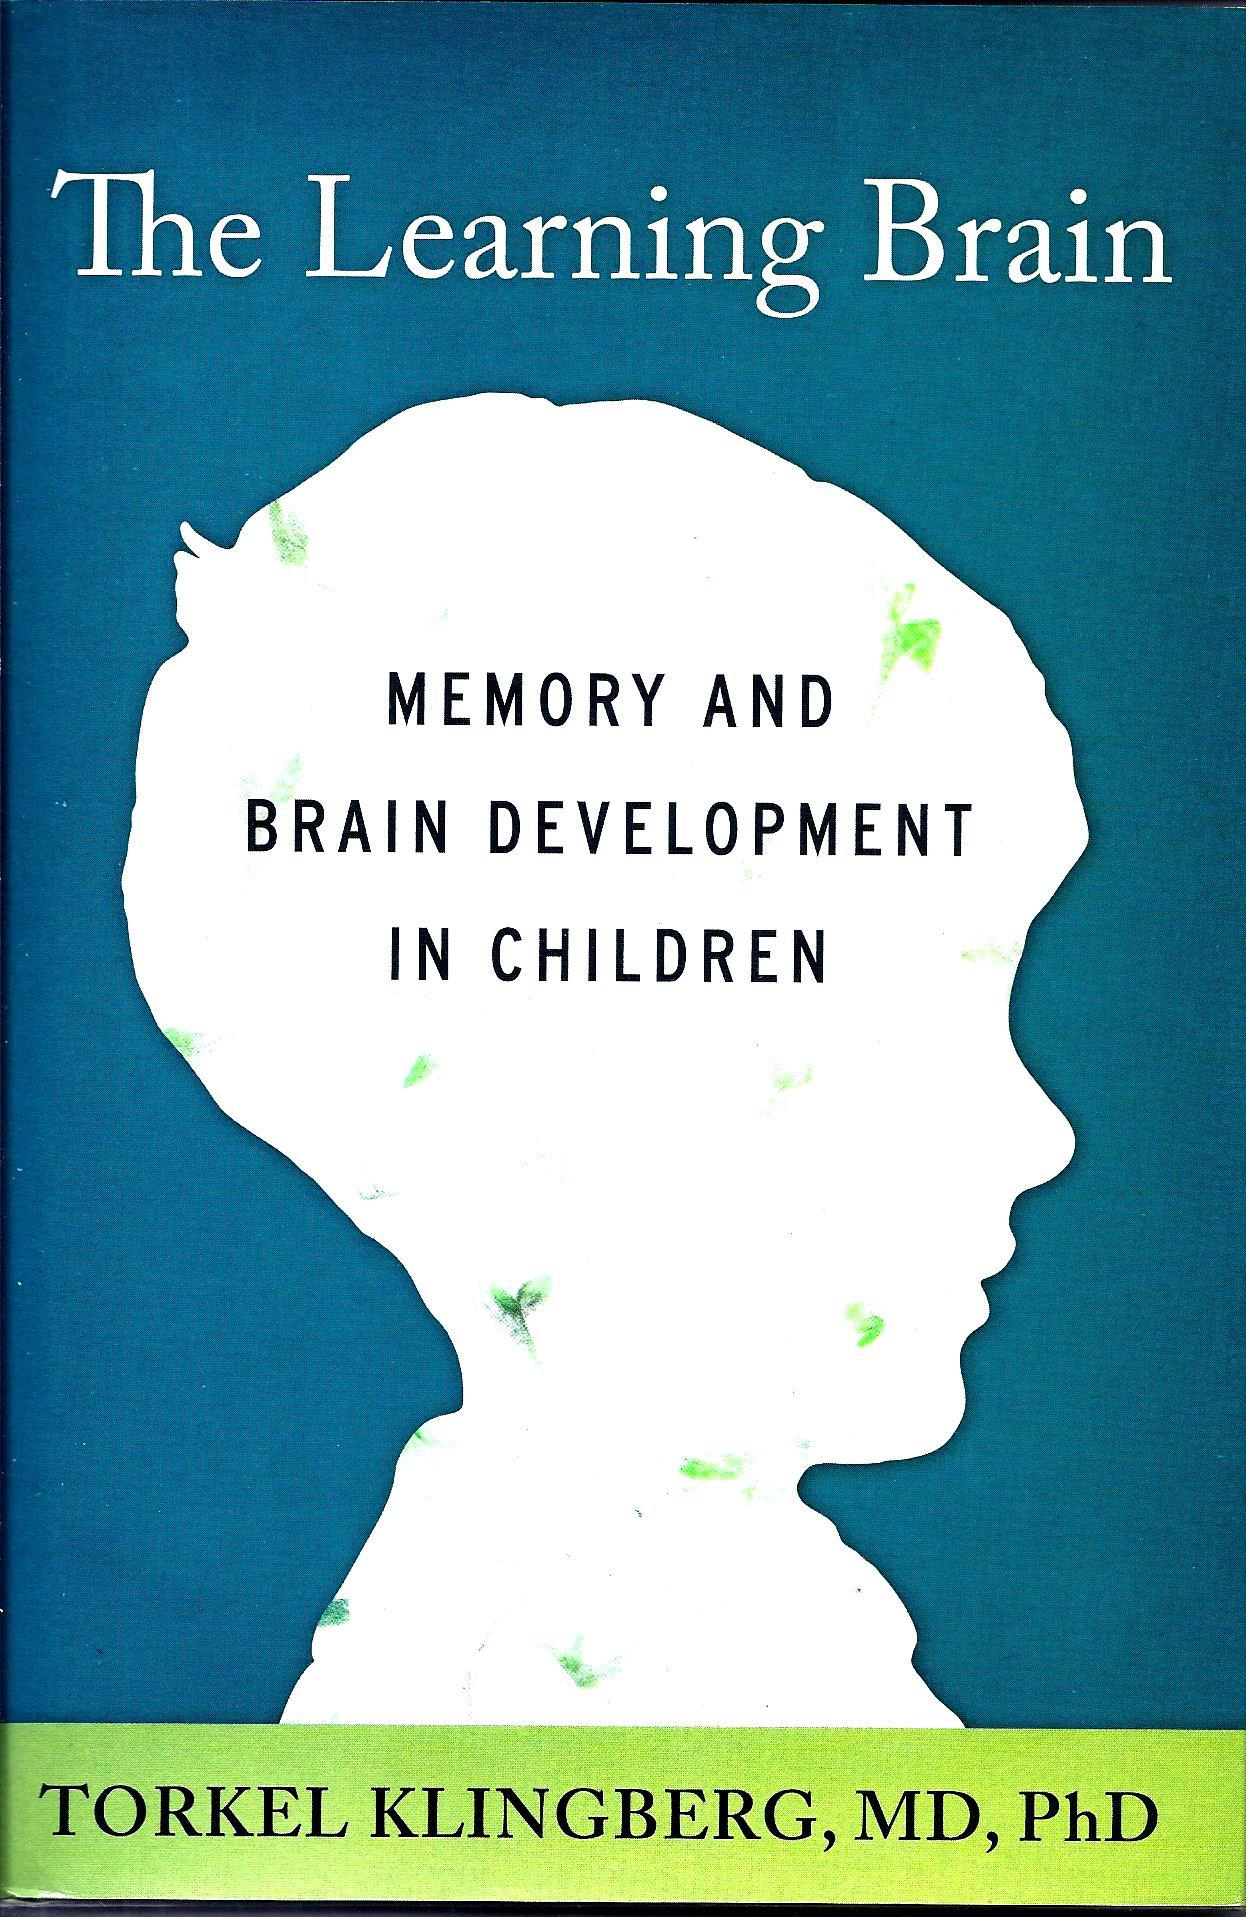 The Learning Brain Memory and Brain Development in Children-584